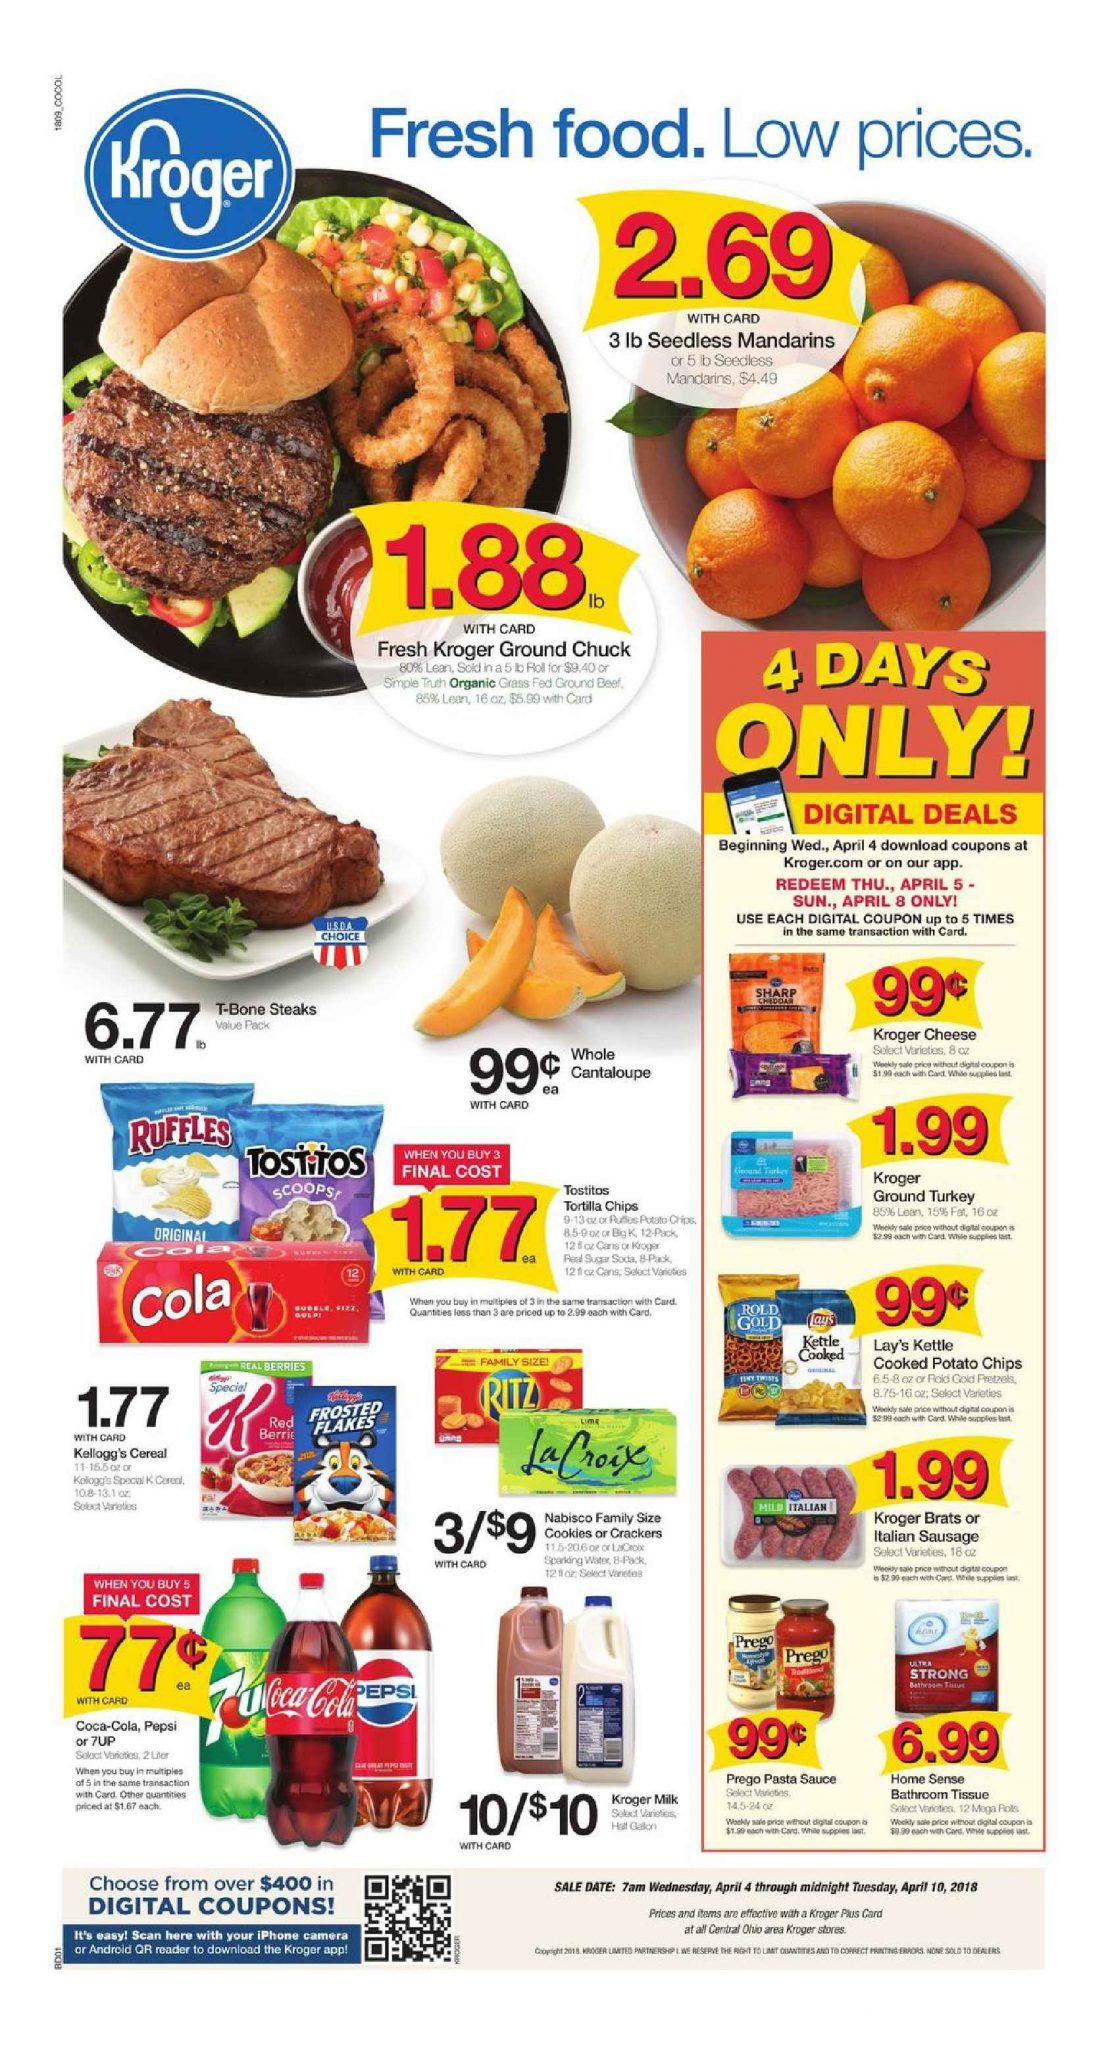 Kroger Weekly Ad Flyer March 11 17 2020 Weeklyad123 Com Kroger Weekly Ads Food Menu